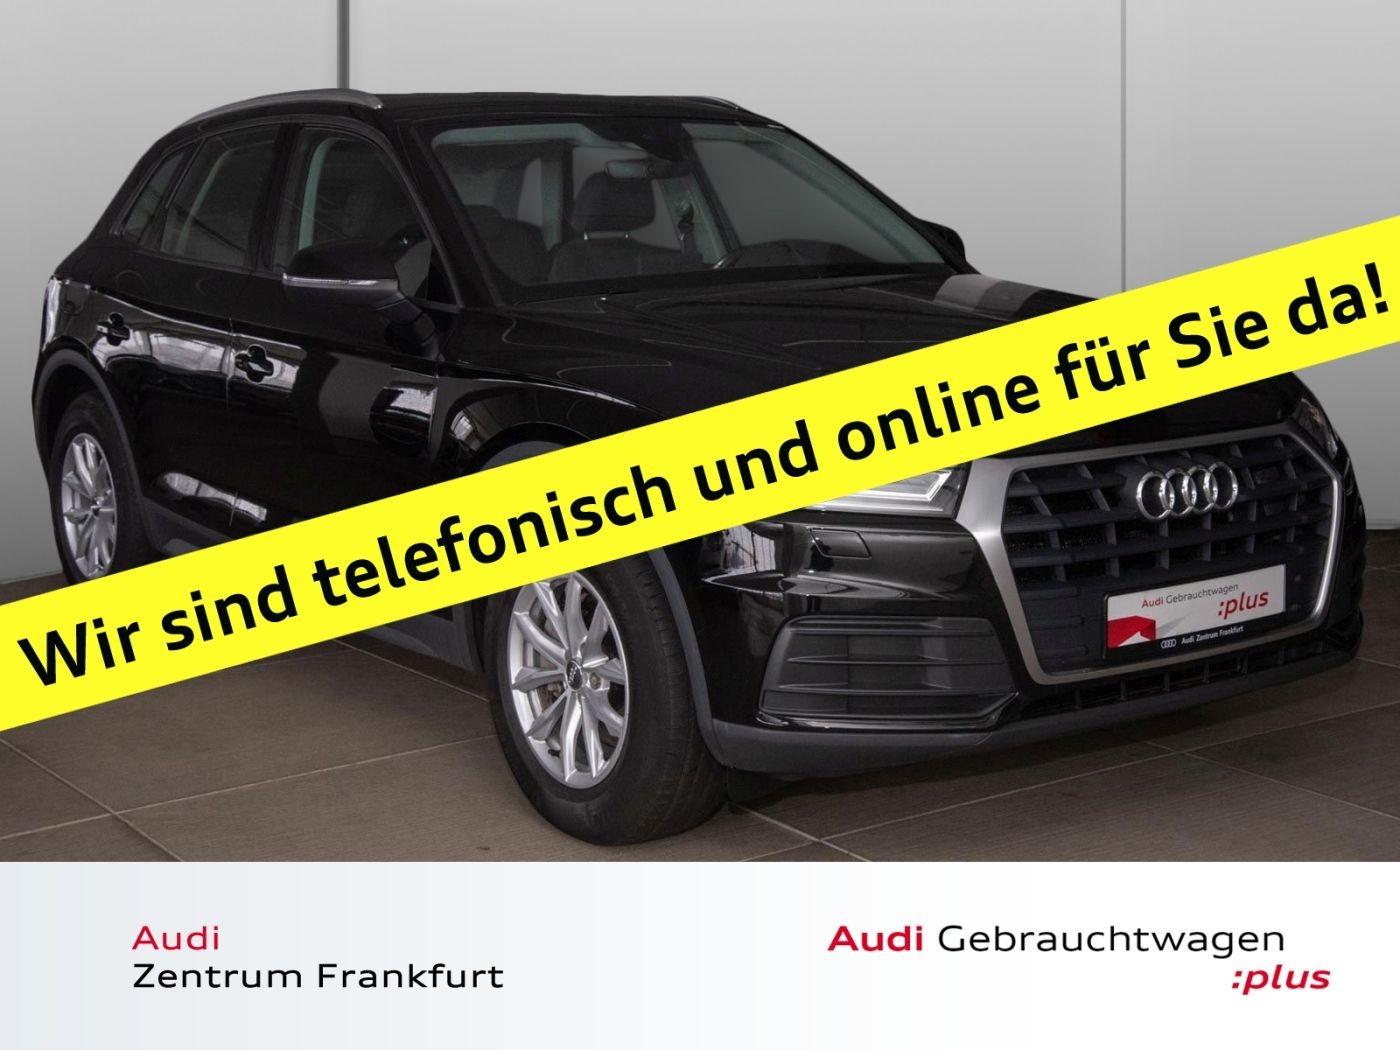 Audi Q5 2.0 TDI Navi Xenon Tempomat PDC Sitzheizung, Jahr 2017, Diesel